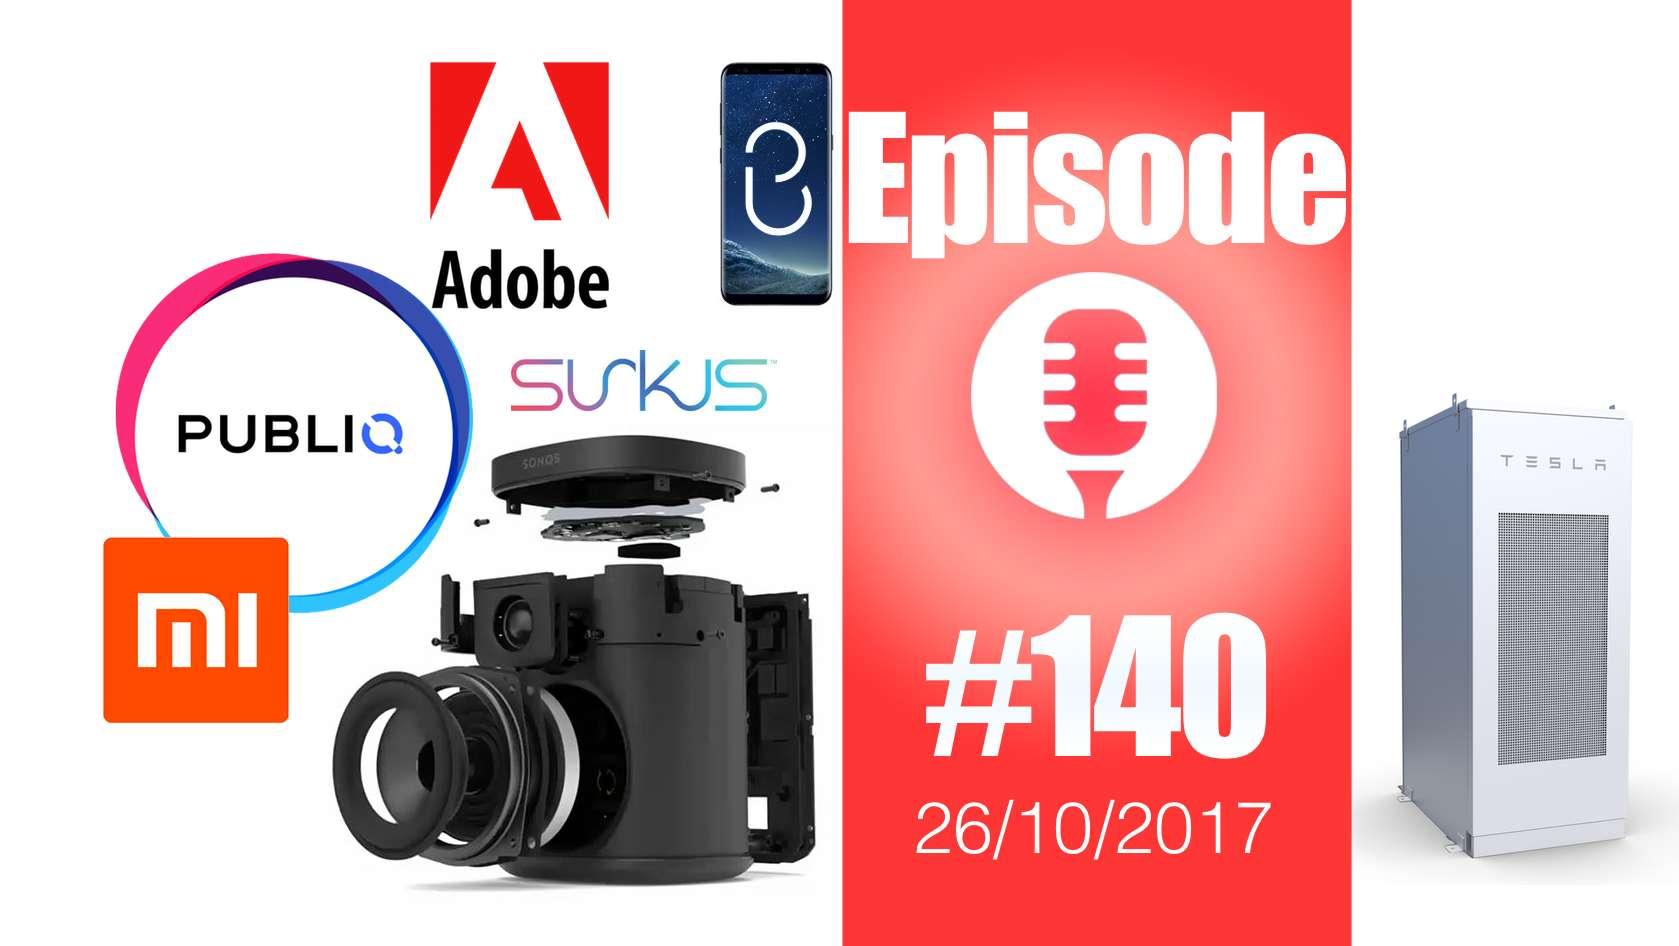 #140: Sonos One, Bixby, Publiq, Hitwizard, Alpha Go, Tesla Powerpack à Porto Rico, Surkus, Adobe Cloak,…